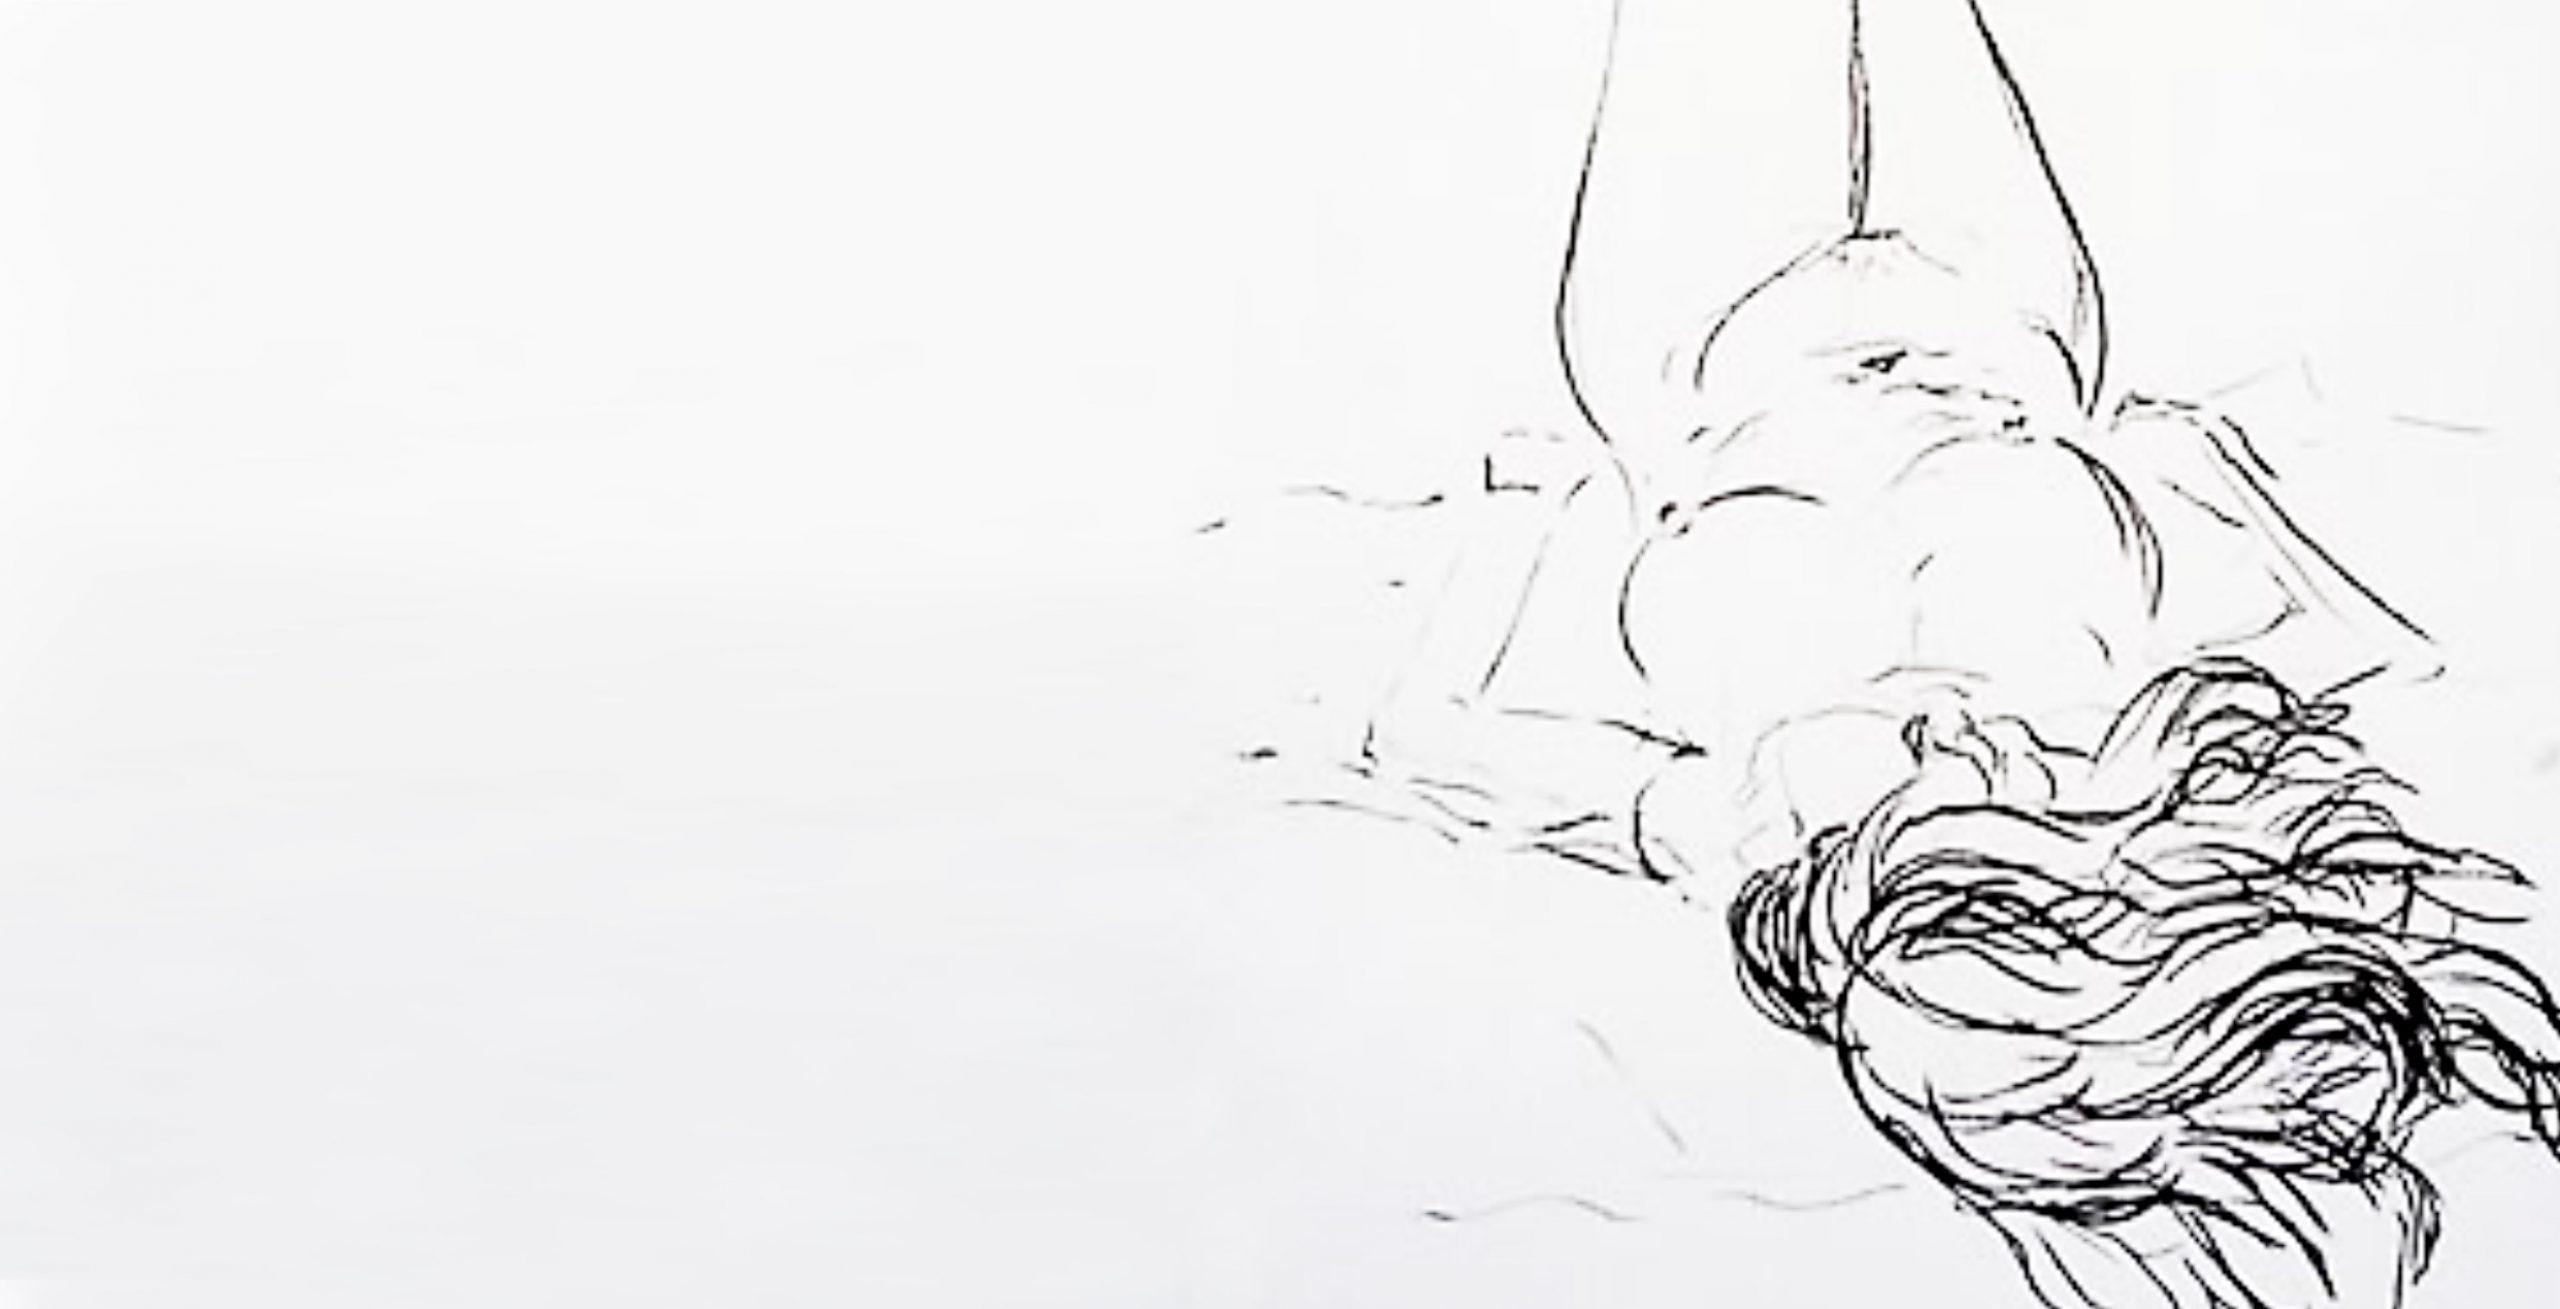 MODEL DRAWINGS & SELF PORTRAITS